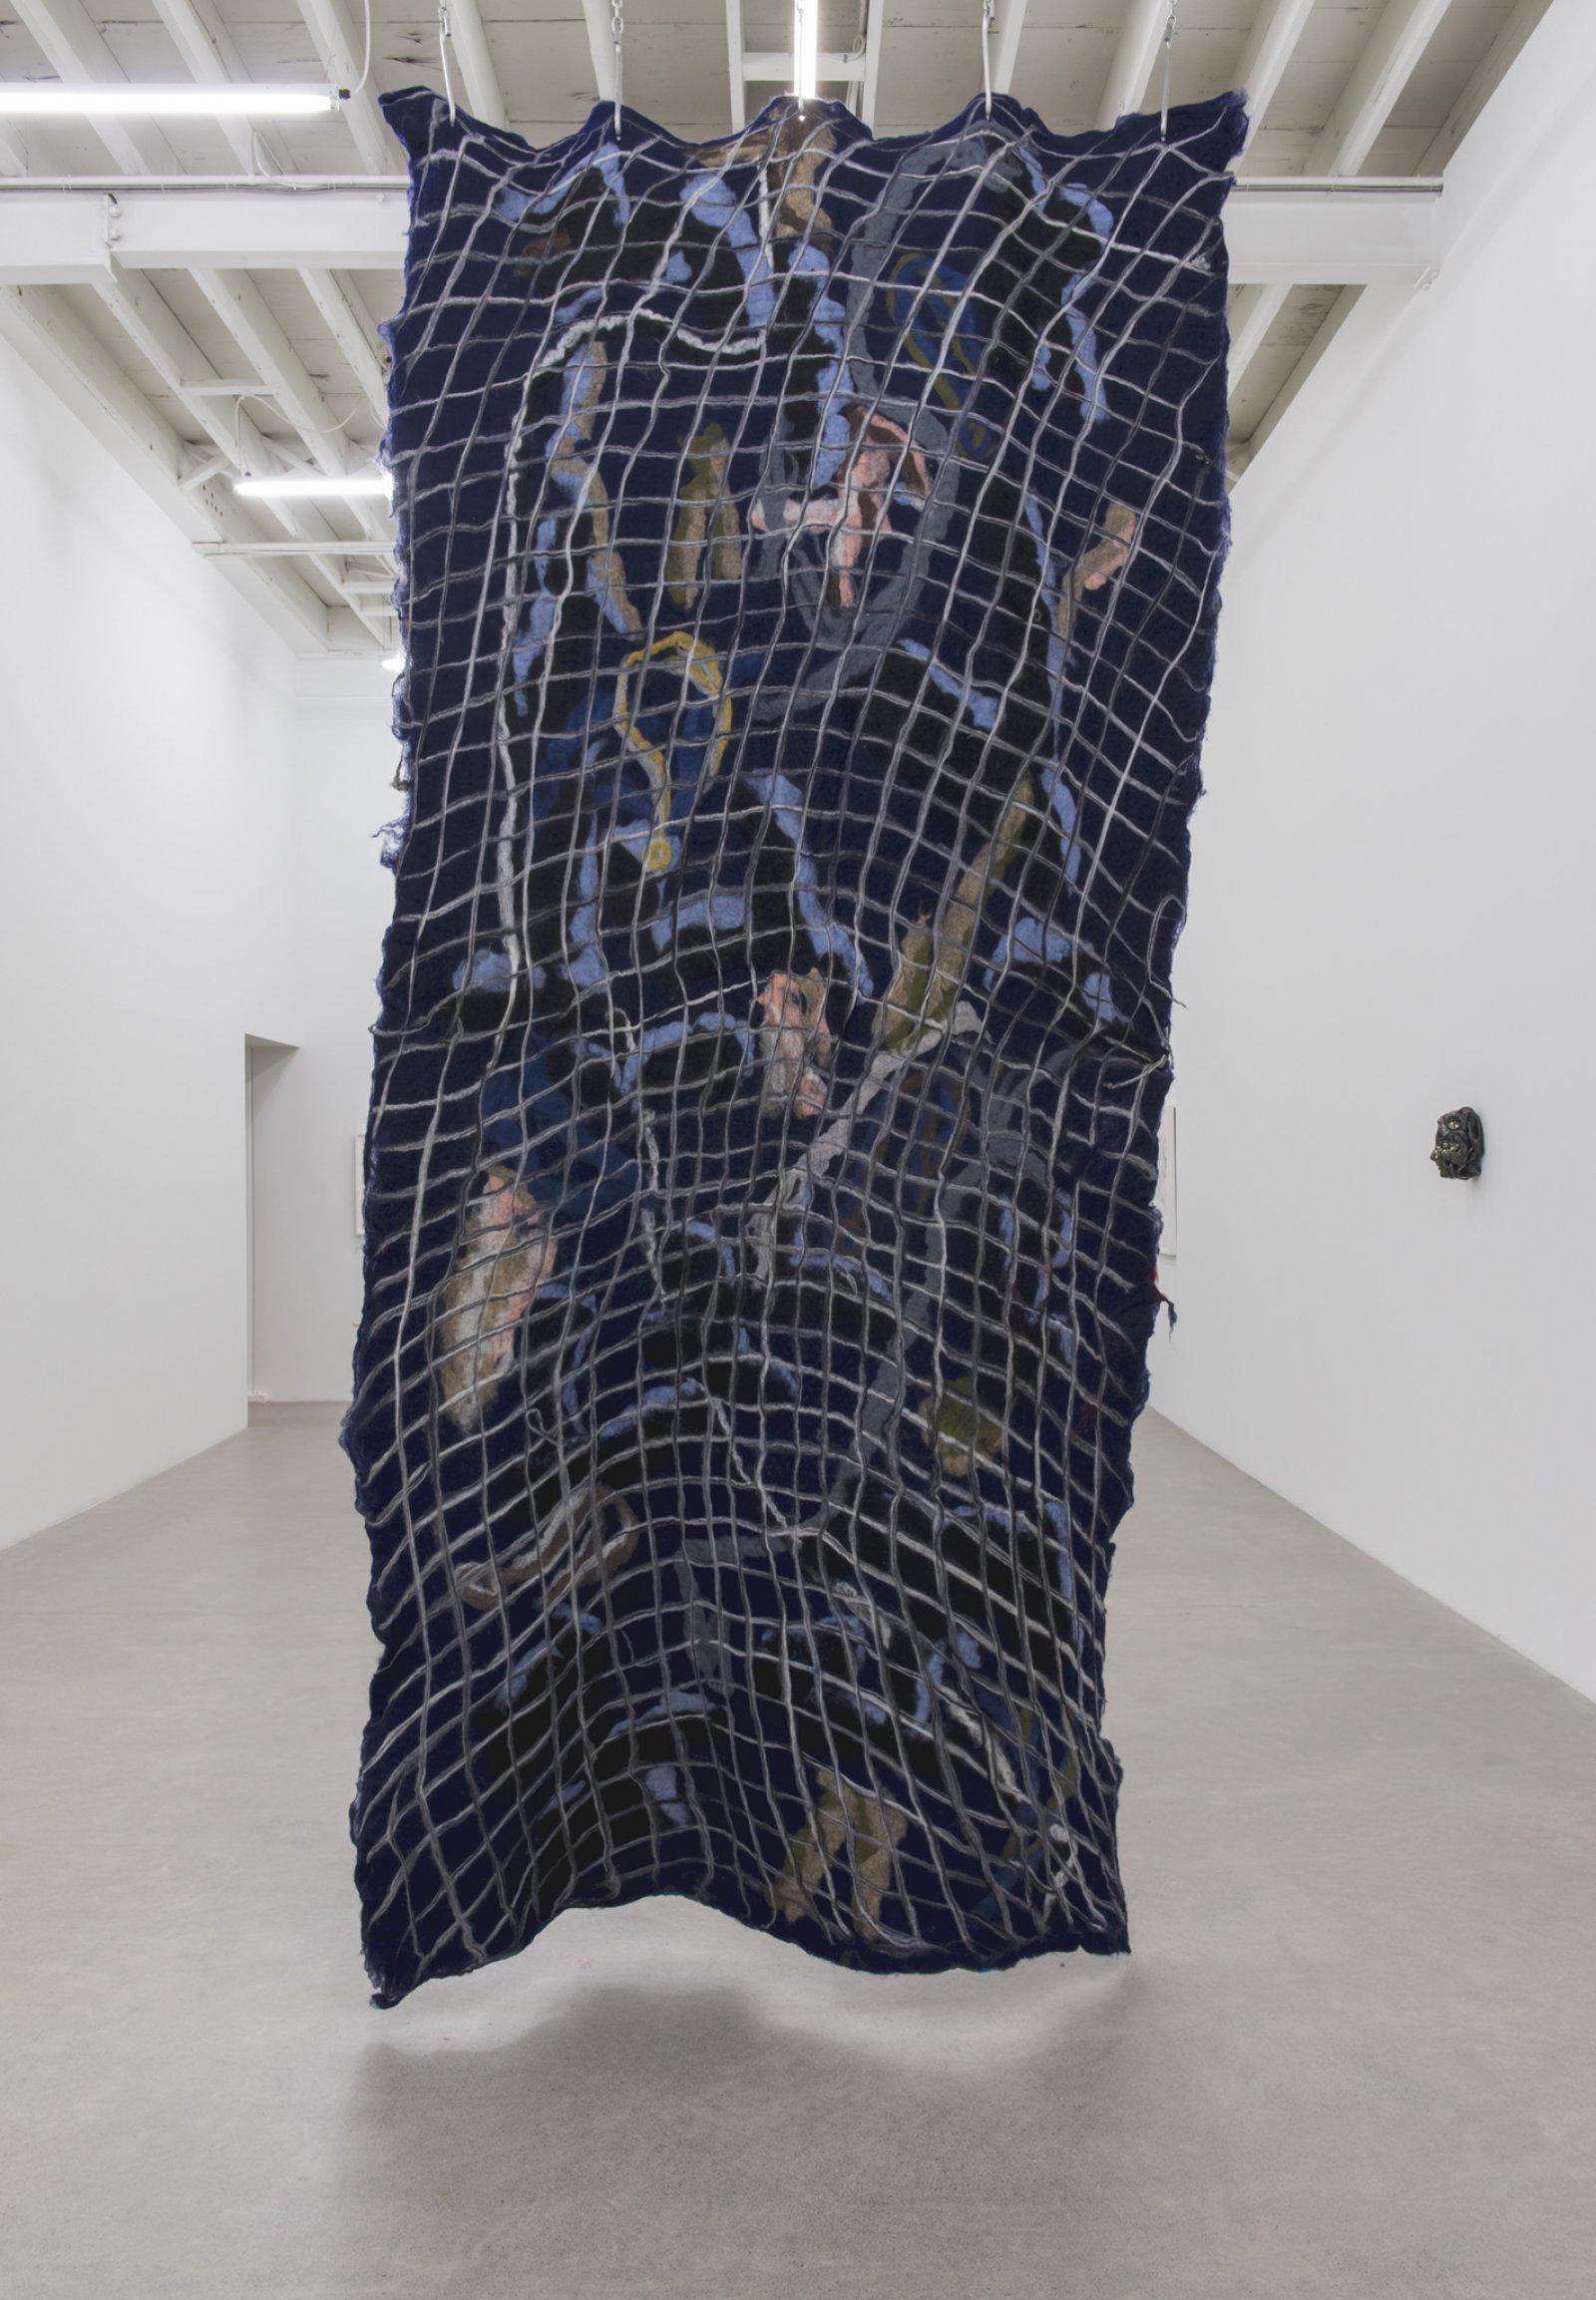 Rebecca Brewer,Silent Running, 2018, wool felt, aluminum hooks, steel chain, 187 x 62 x 12 in. (475 x 158 x 31 cm)